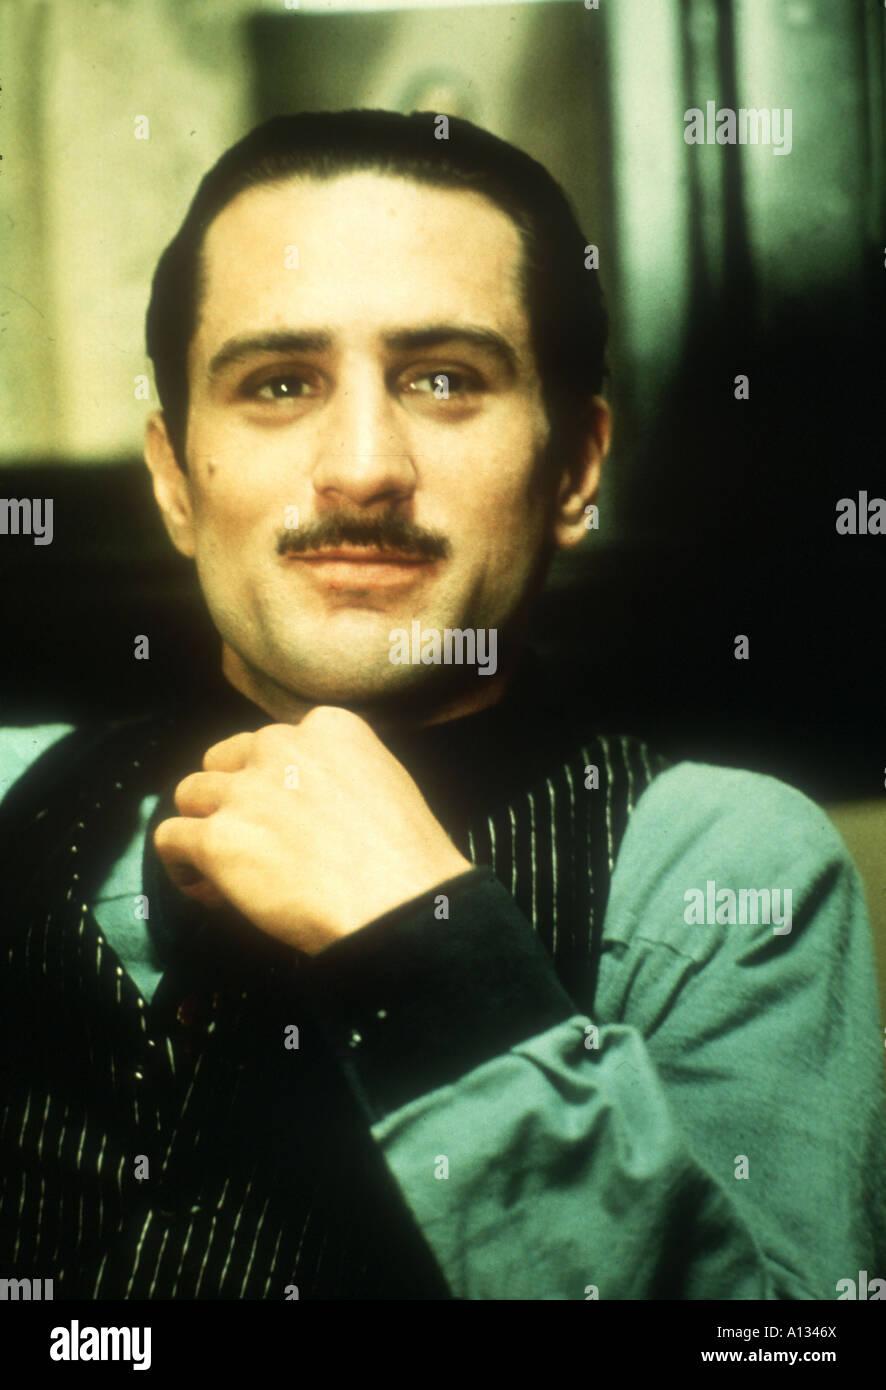 Der Pate Teil Ii 1975 Francis Ford Coppola Robert De Niro Stockfoto